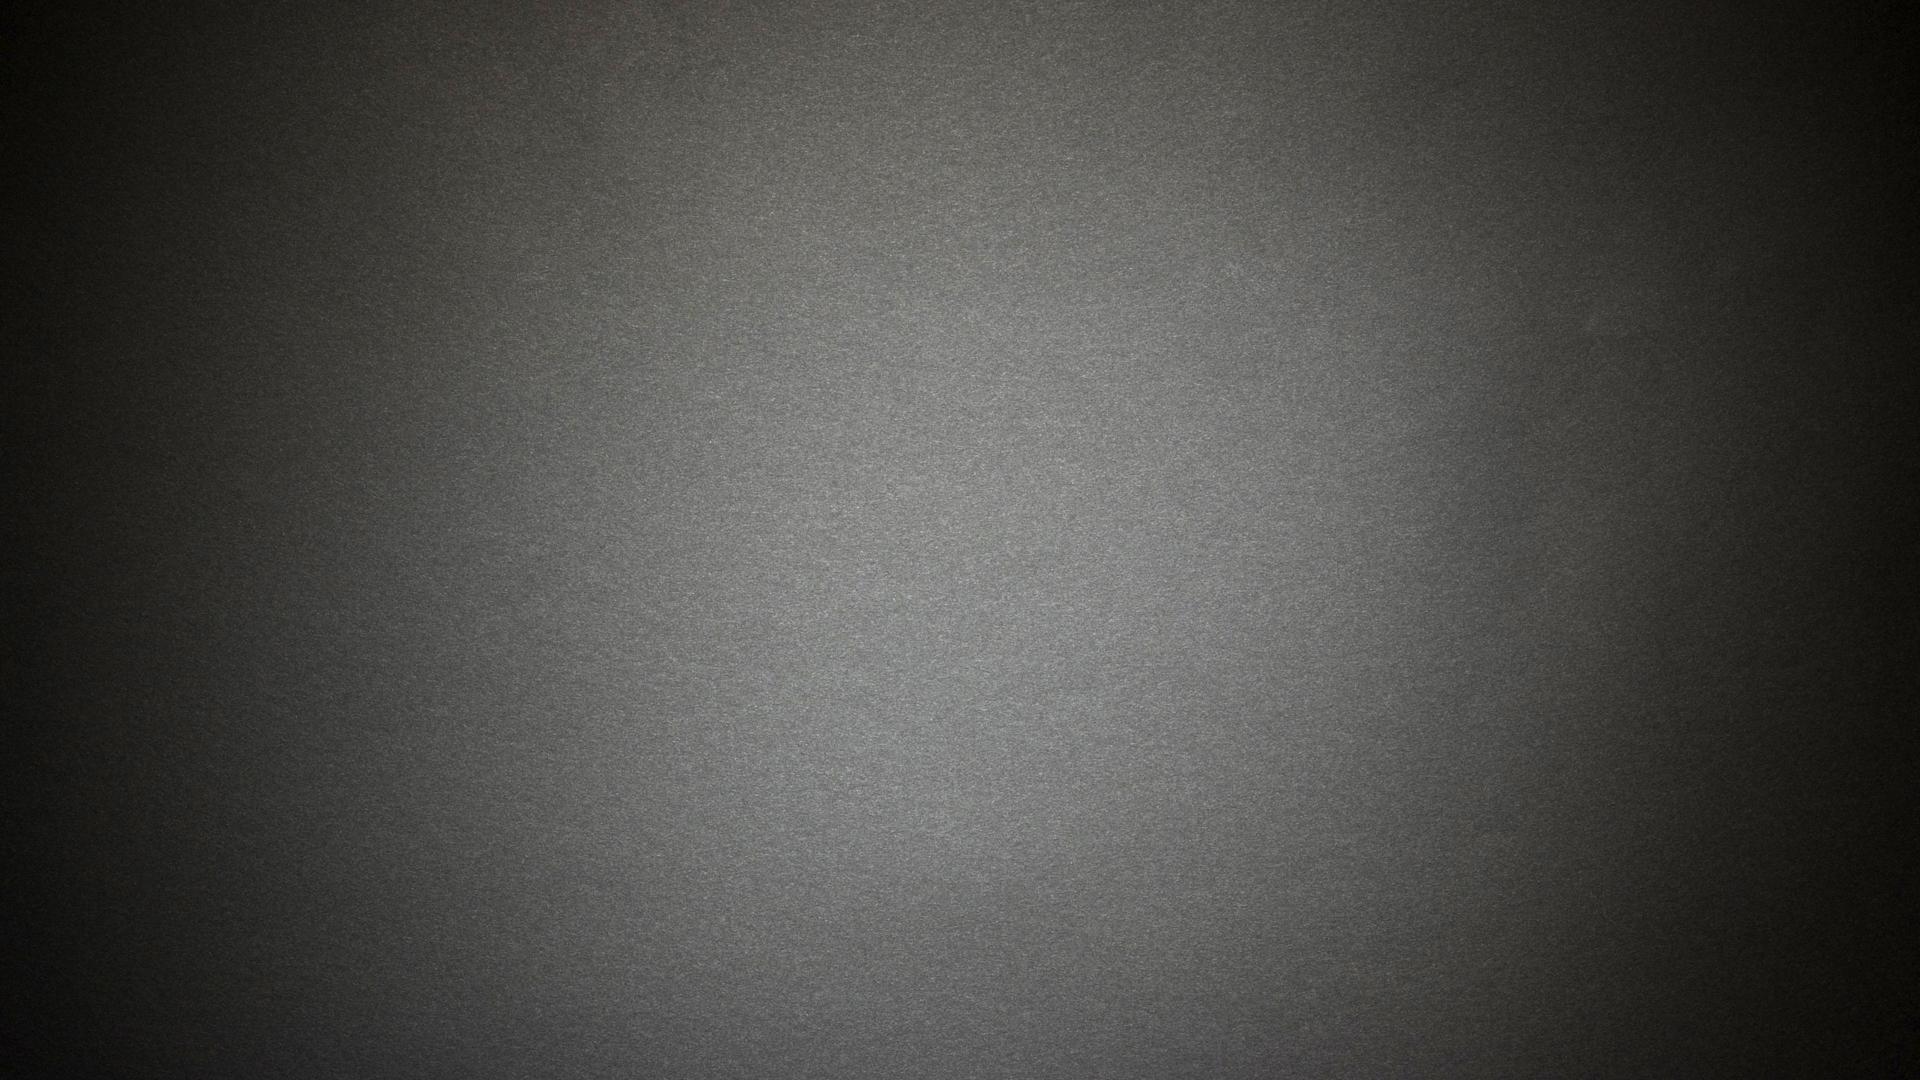 free-wallpaper-for-website-background-wallpaperwebsites ...